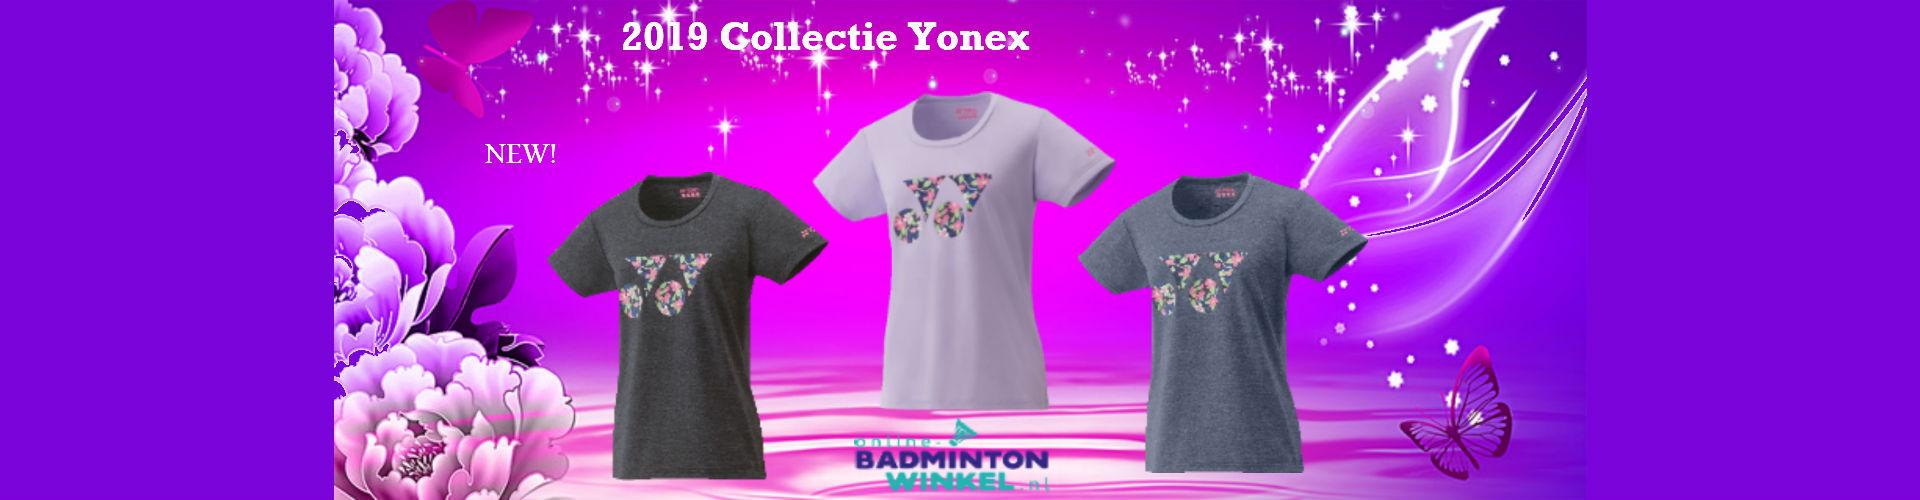 New Yonex 2019 collectie slider